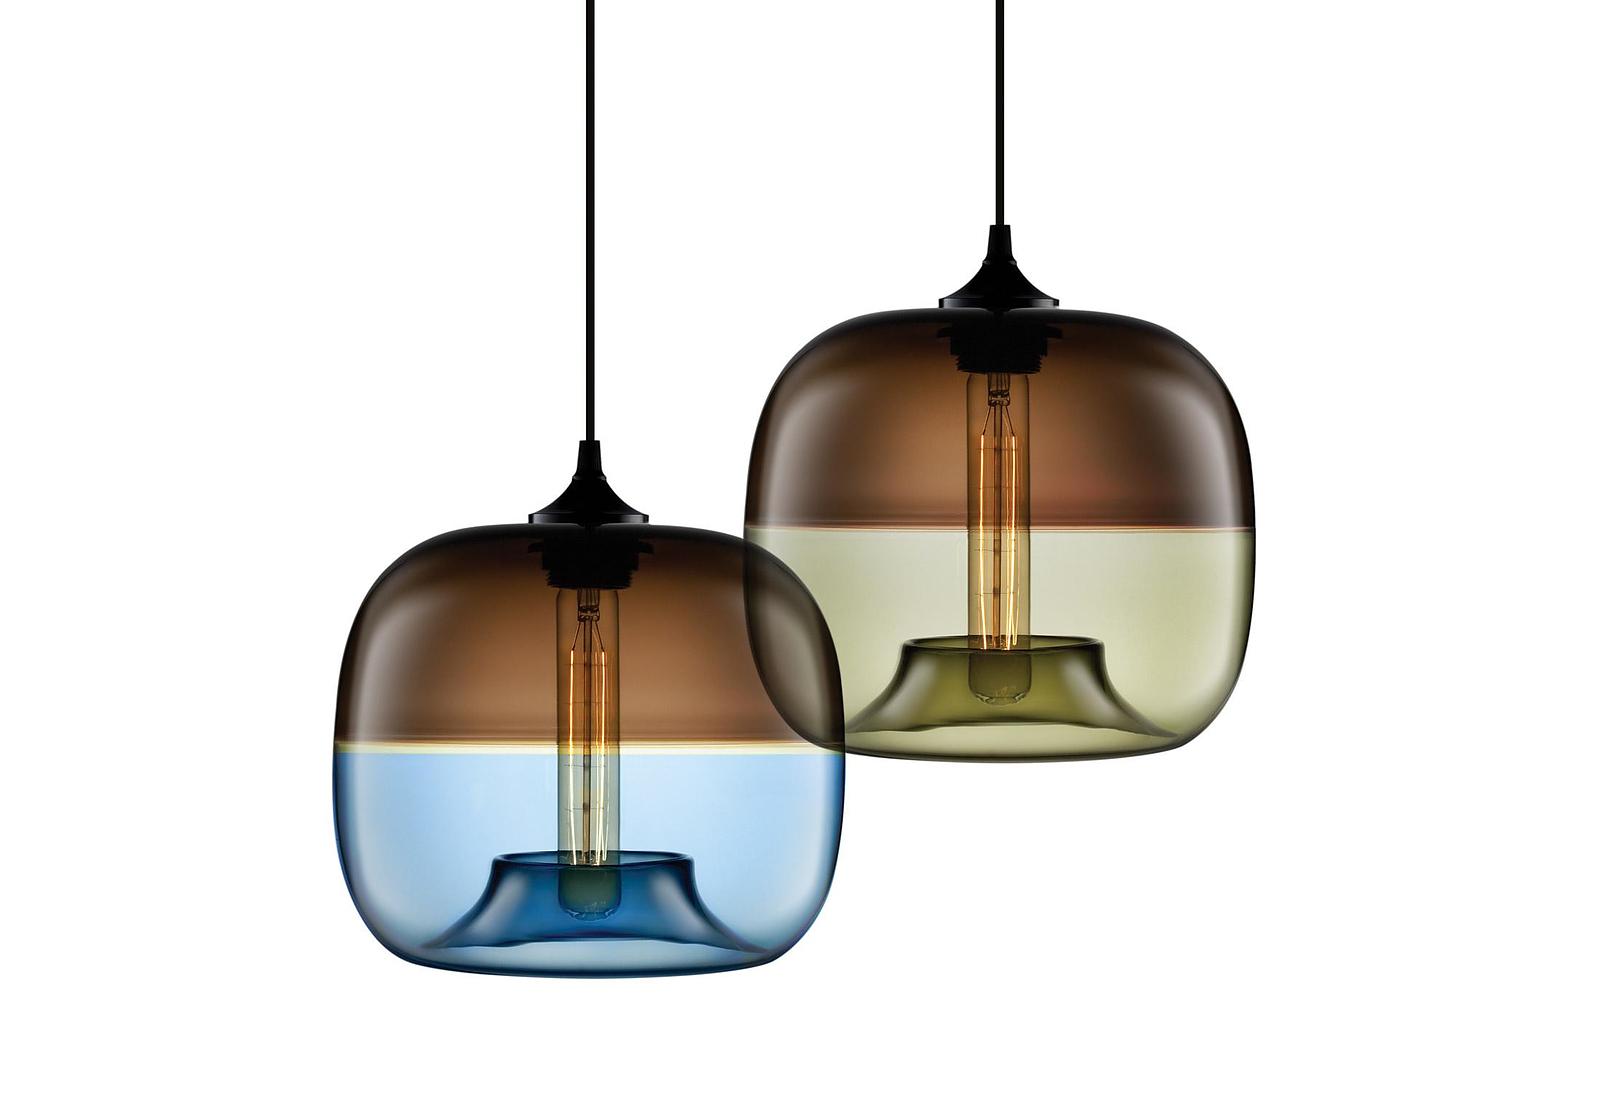 Stunning pendant lights by niche modern design is this for Pendant lighting modern design